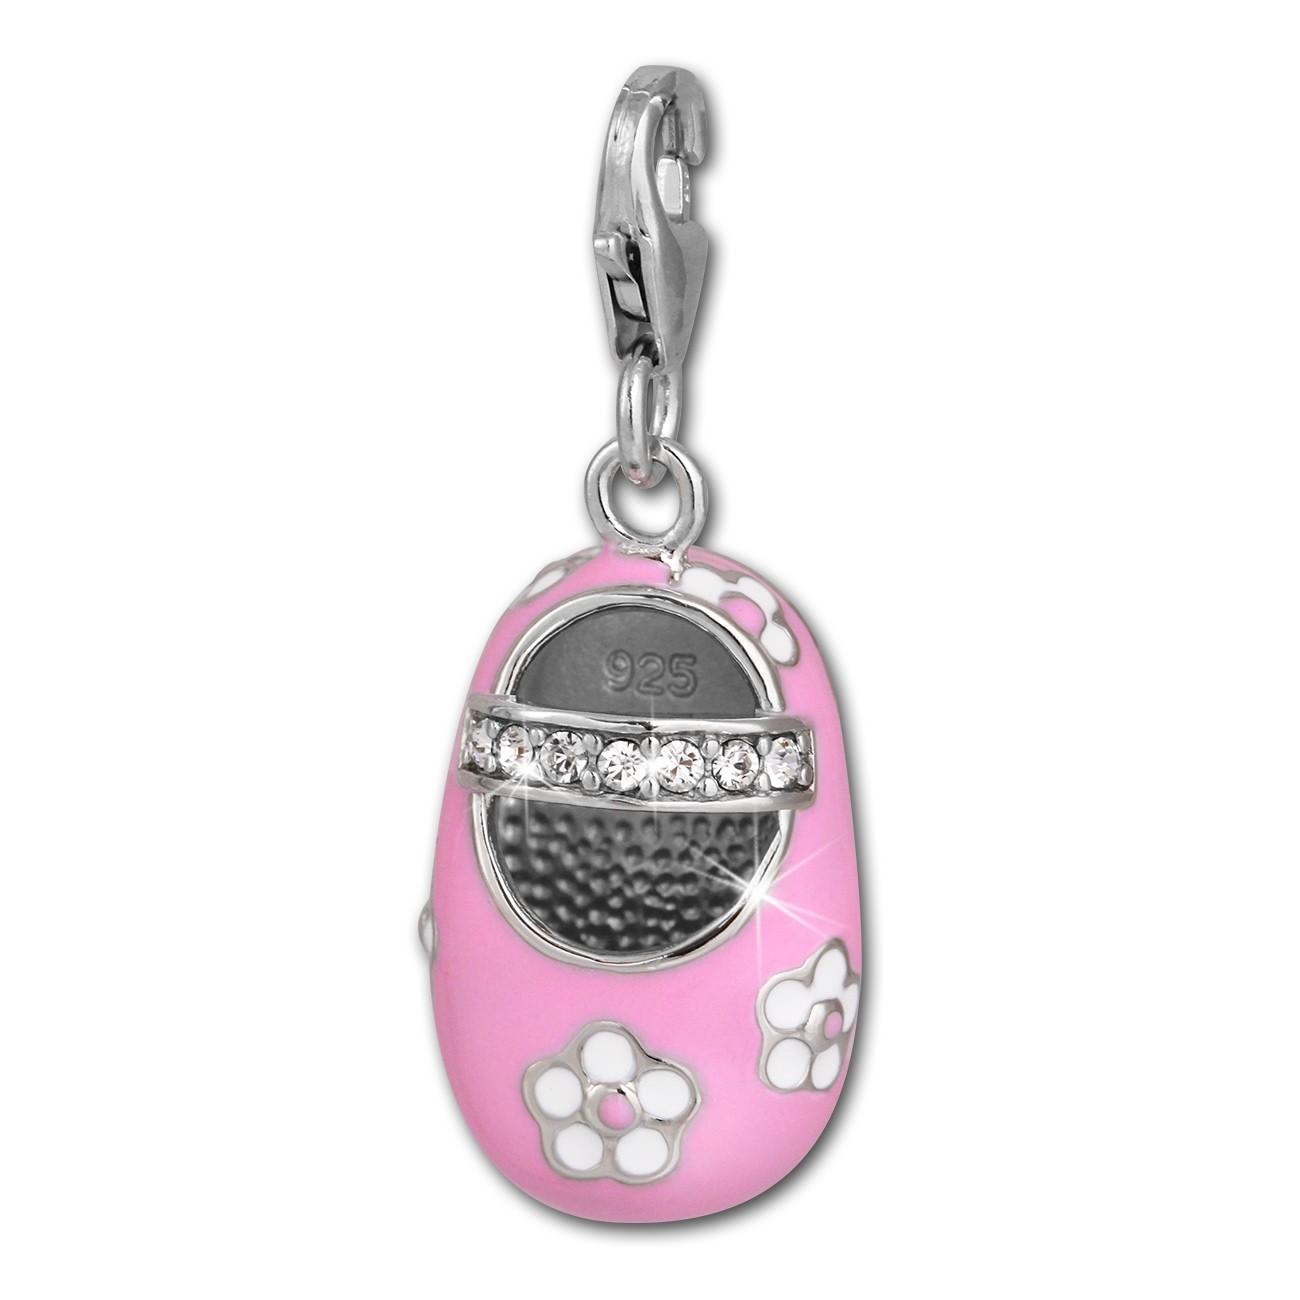 SilberDream Charm Mädchenschuh Blume rosa 925 Silber Armband Anhänger FC853P